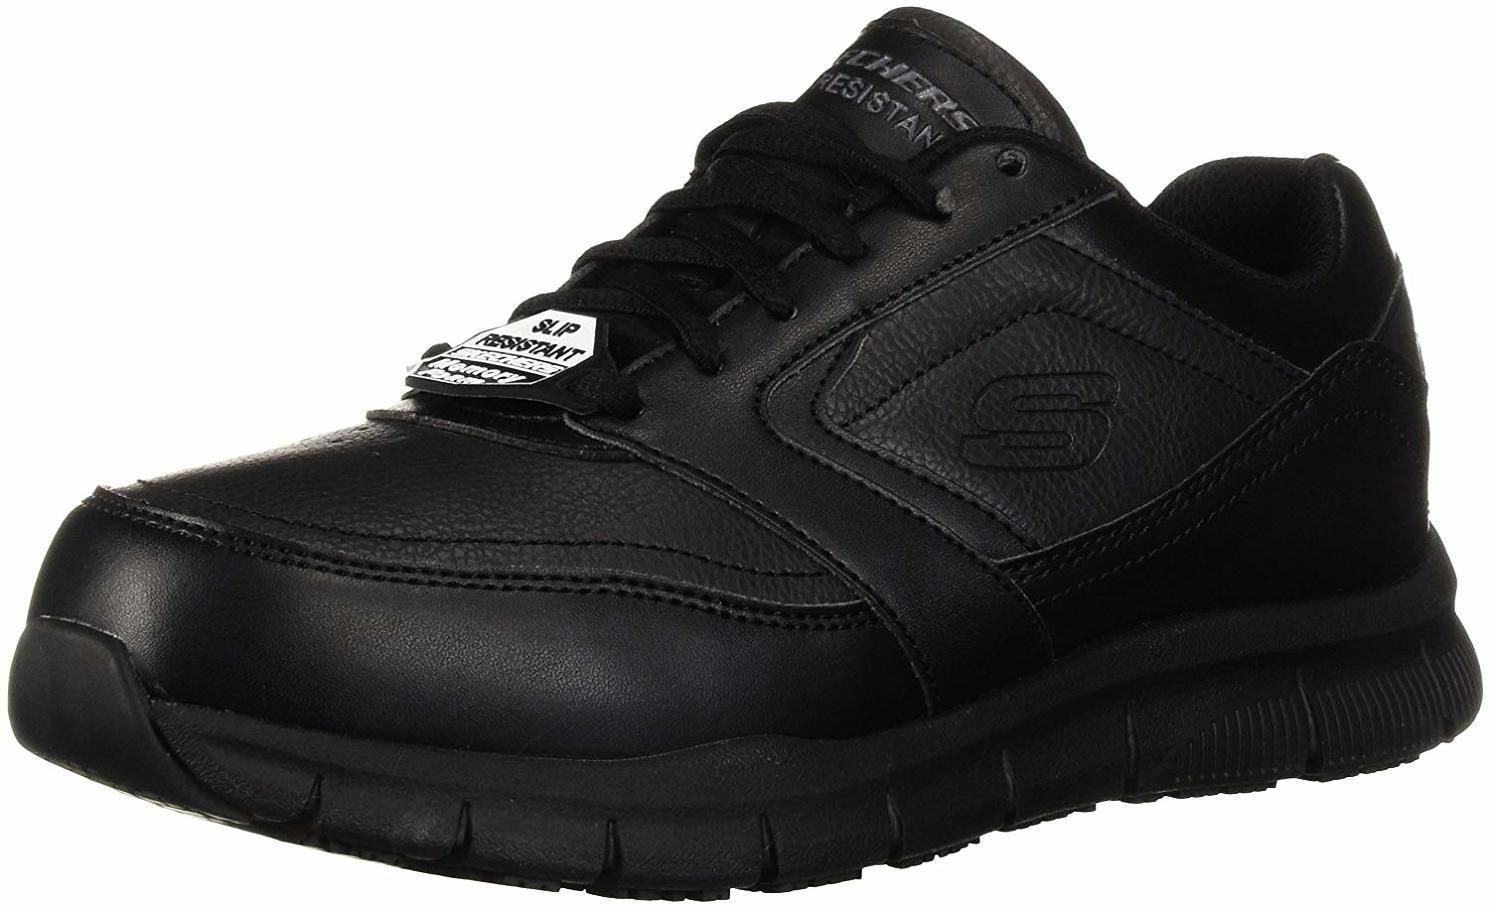 skechers safety shoes uk